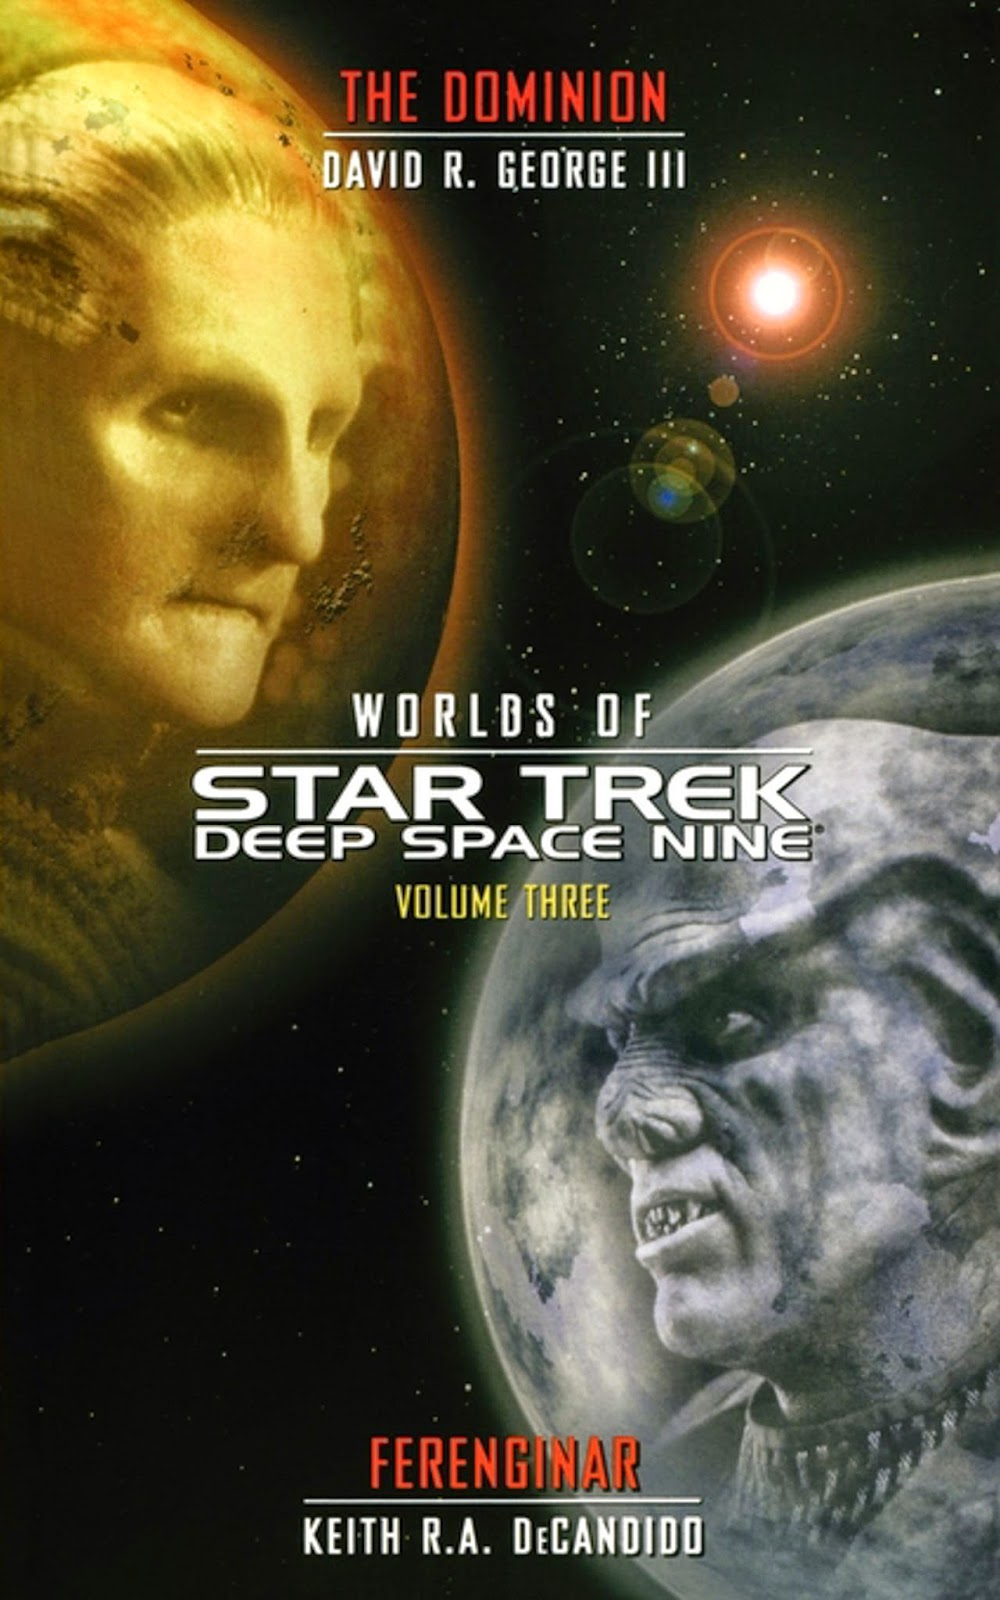 Worlds of Star Trek: Deep Space Nine, Volume Three